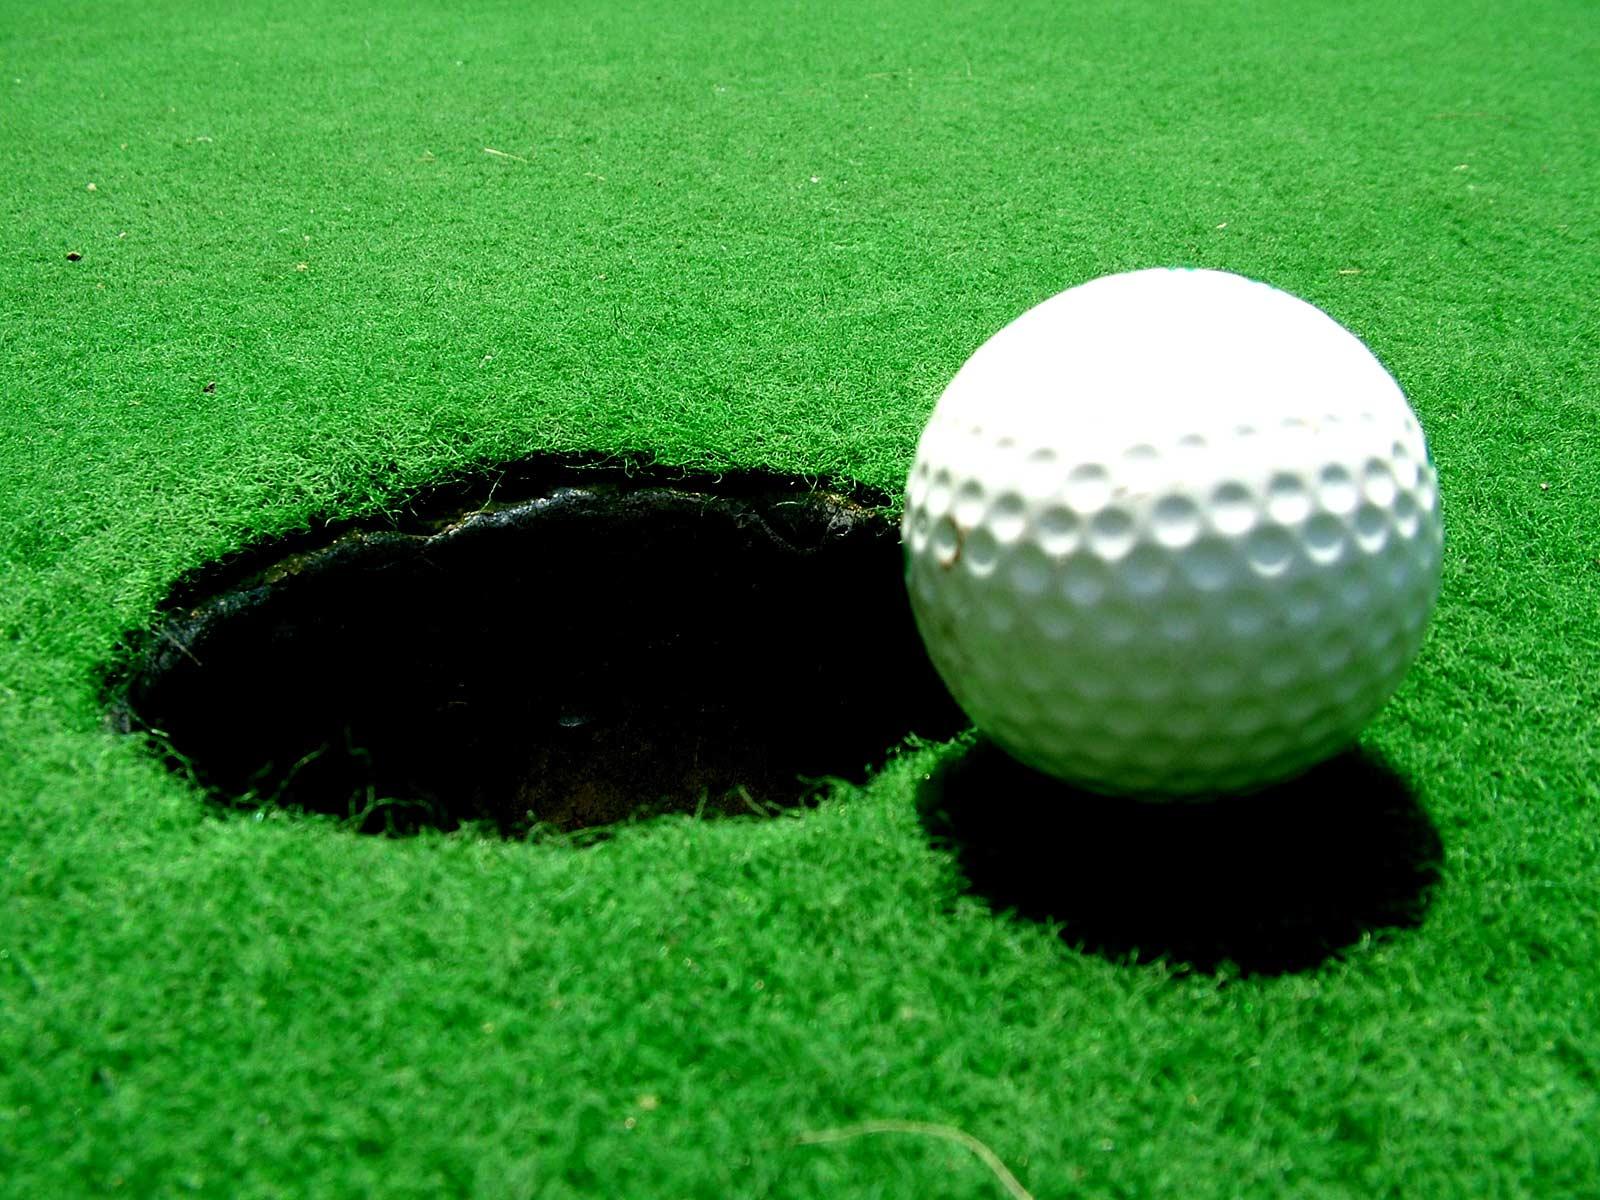 http://4.bp.blogspot.com/-3afmUViJ_jE/TjNjWOkFipI/AAAAAAAAANQ/CKDUDQOcgUs/s1600/Golf-Desktop-Wallpaper.jpg